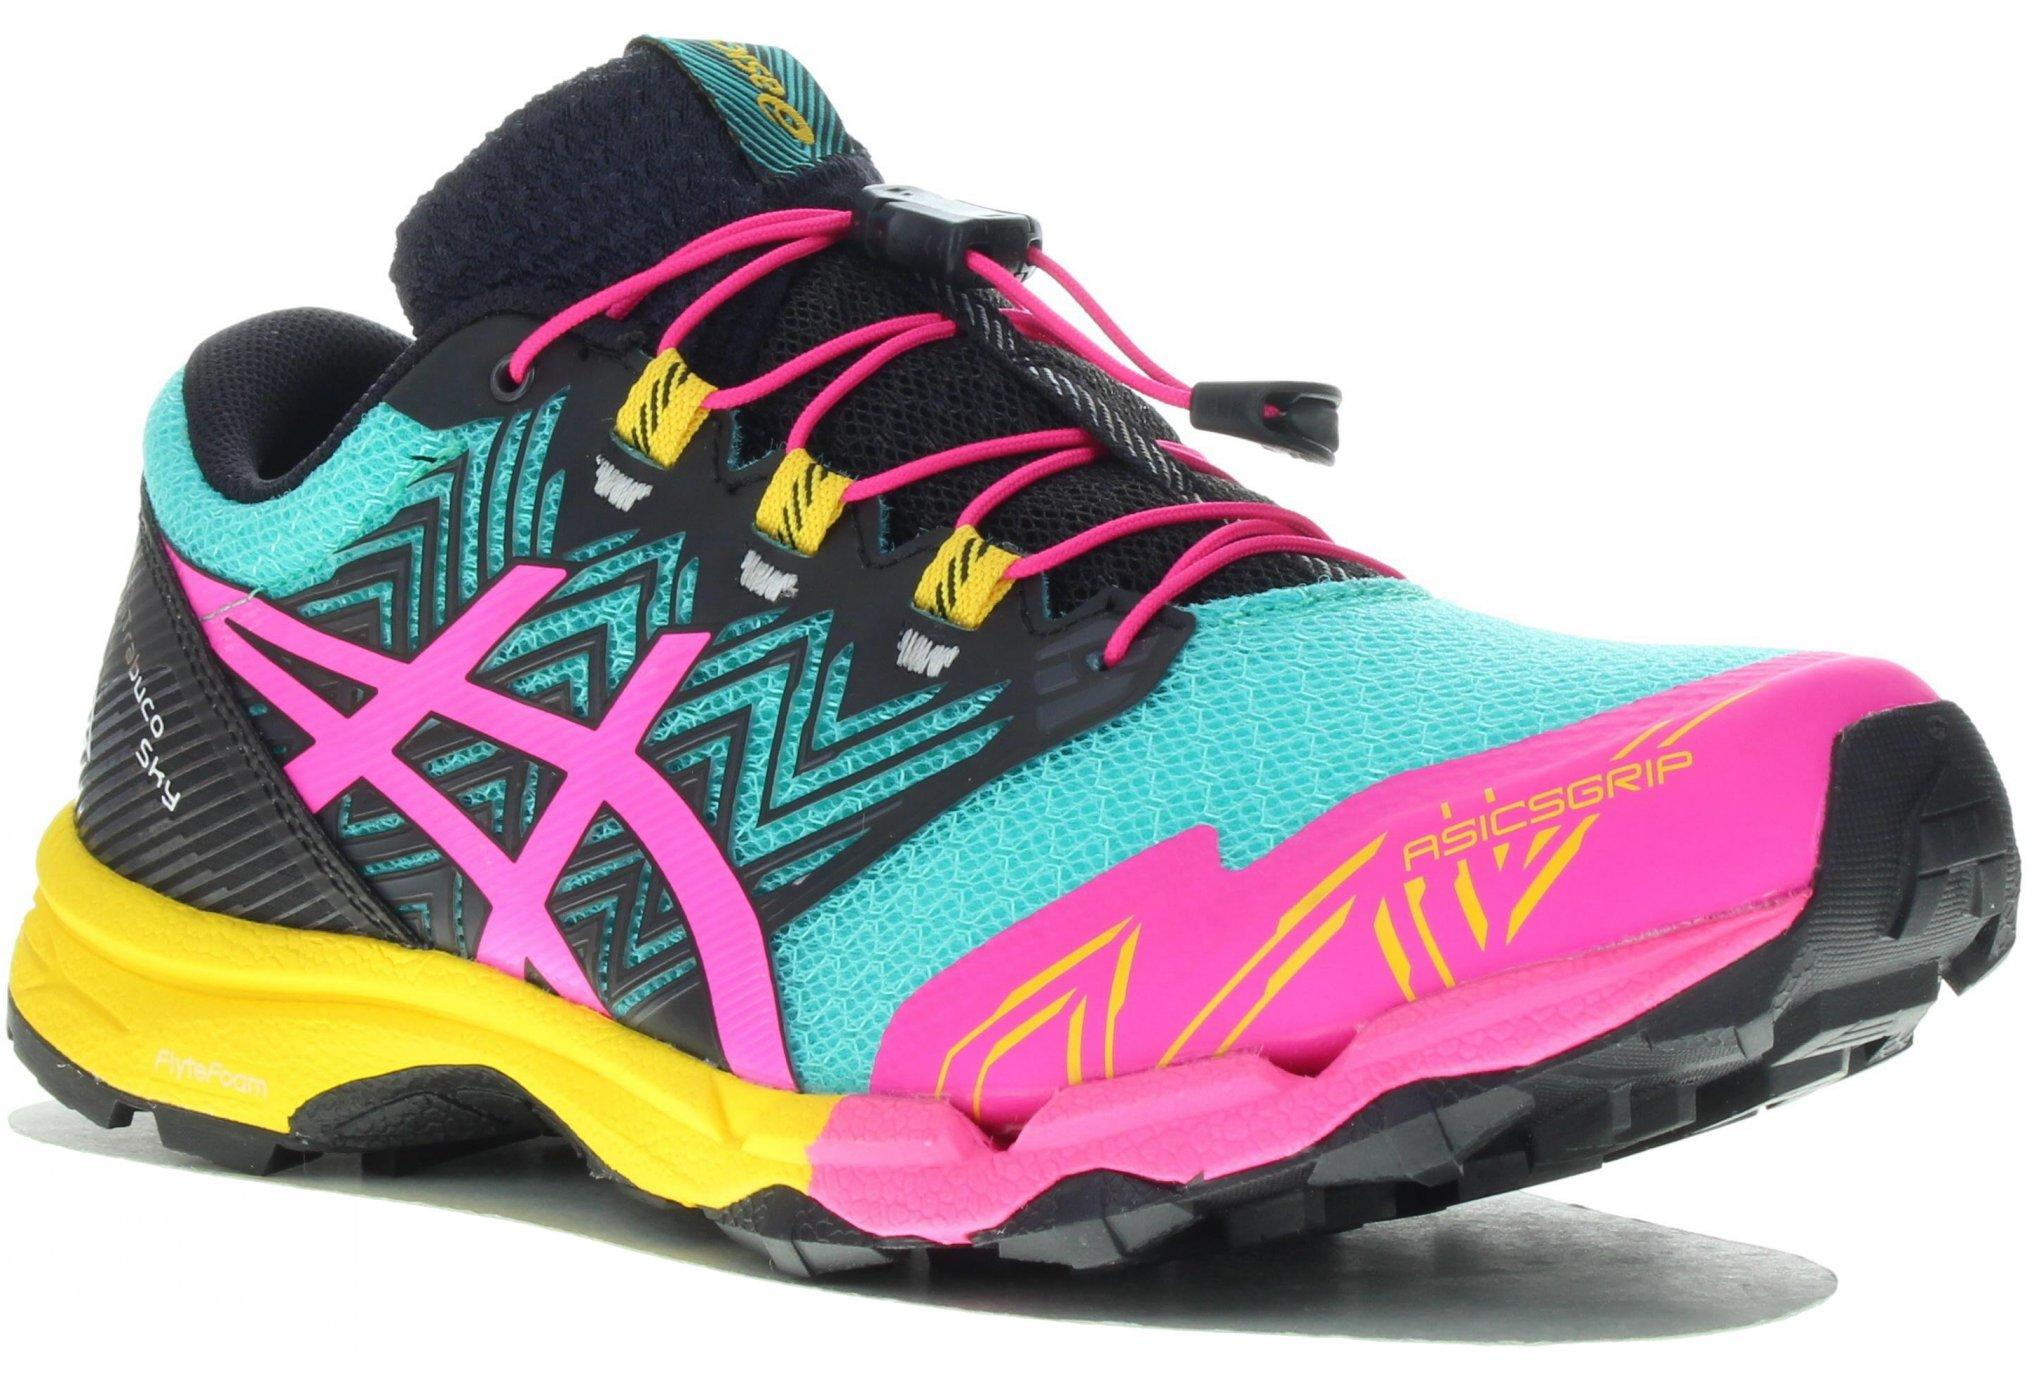 Asics Gel-FujiTrabuco SKY W Chaussures running femme